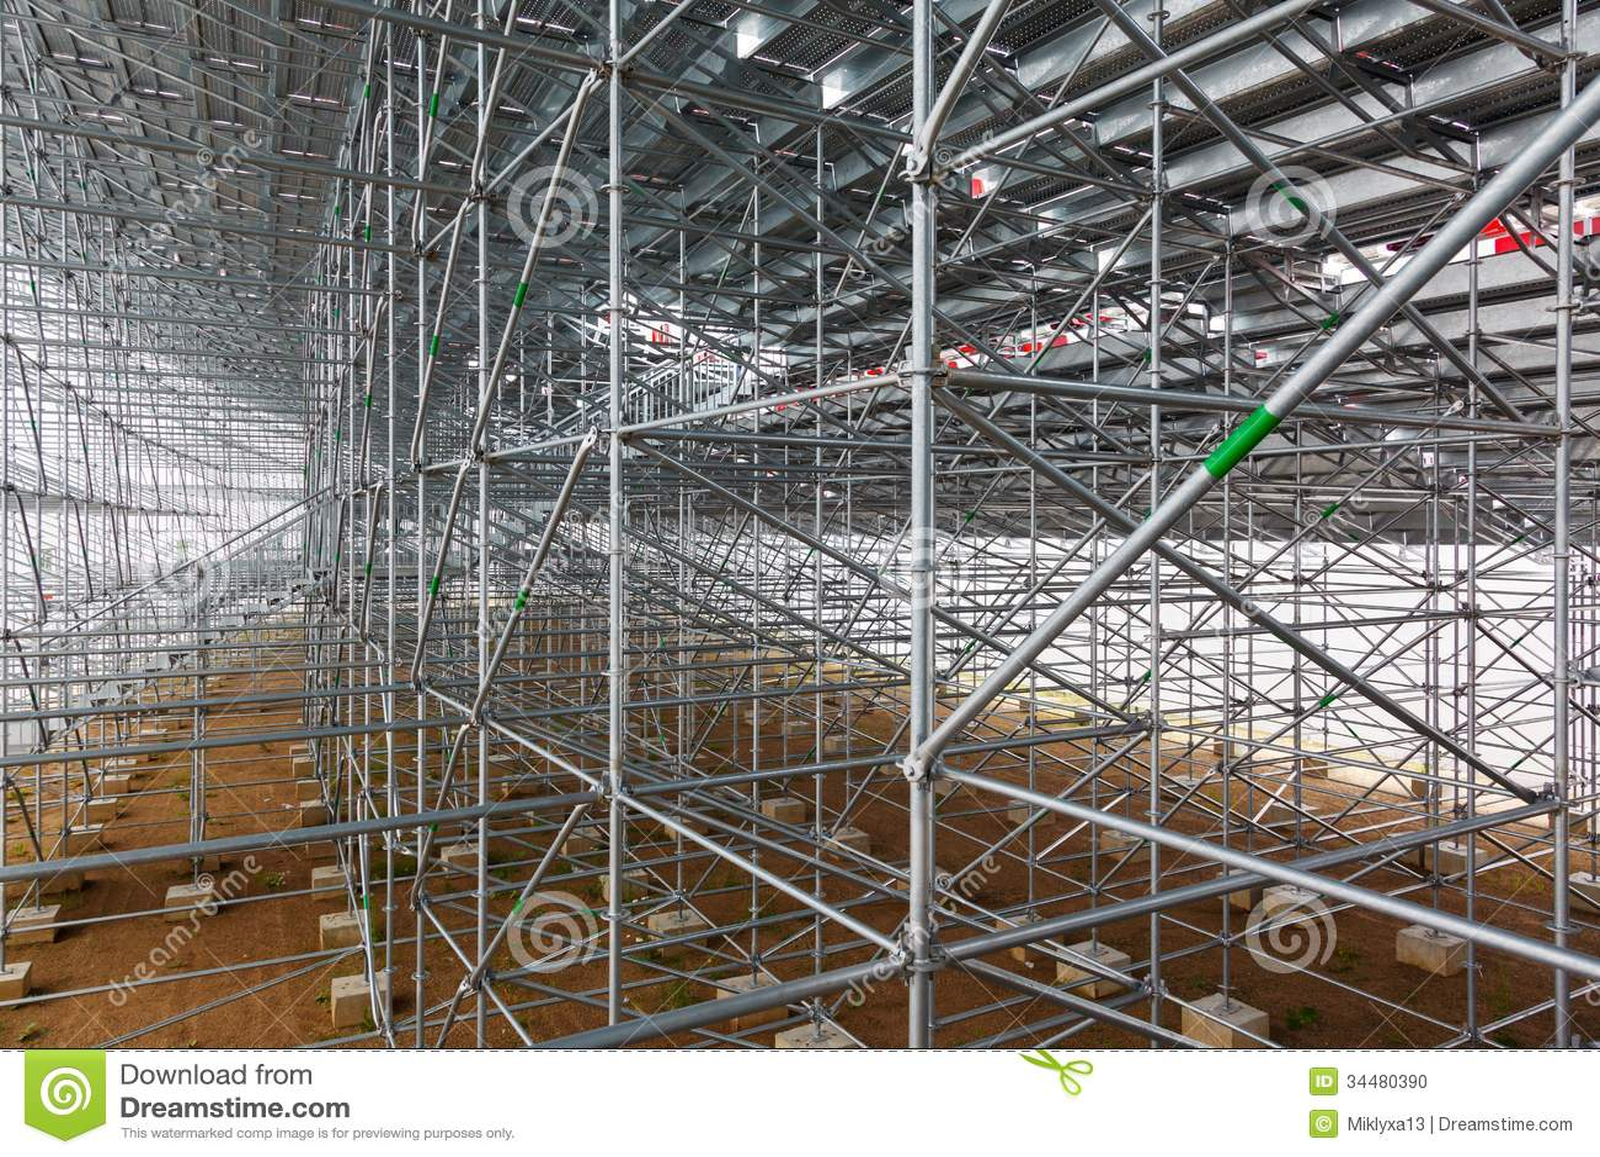 Construction Scaffolding Design : Steel structure of construction scaffolding stock photo